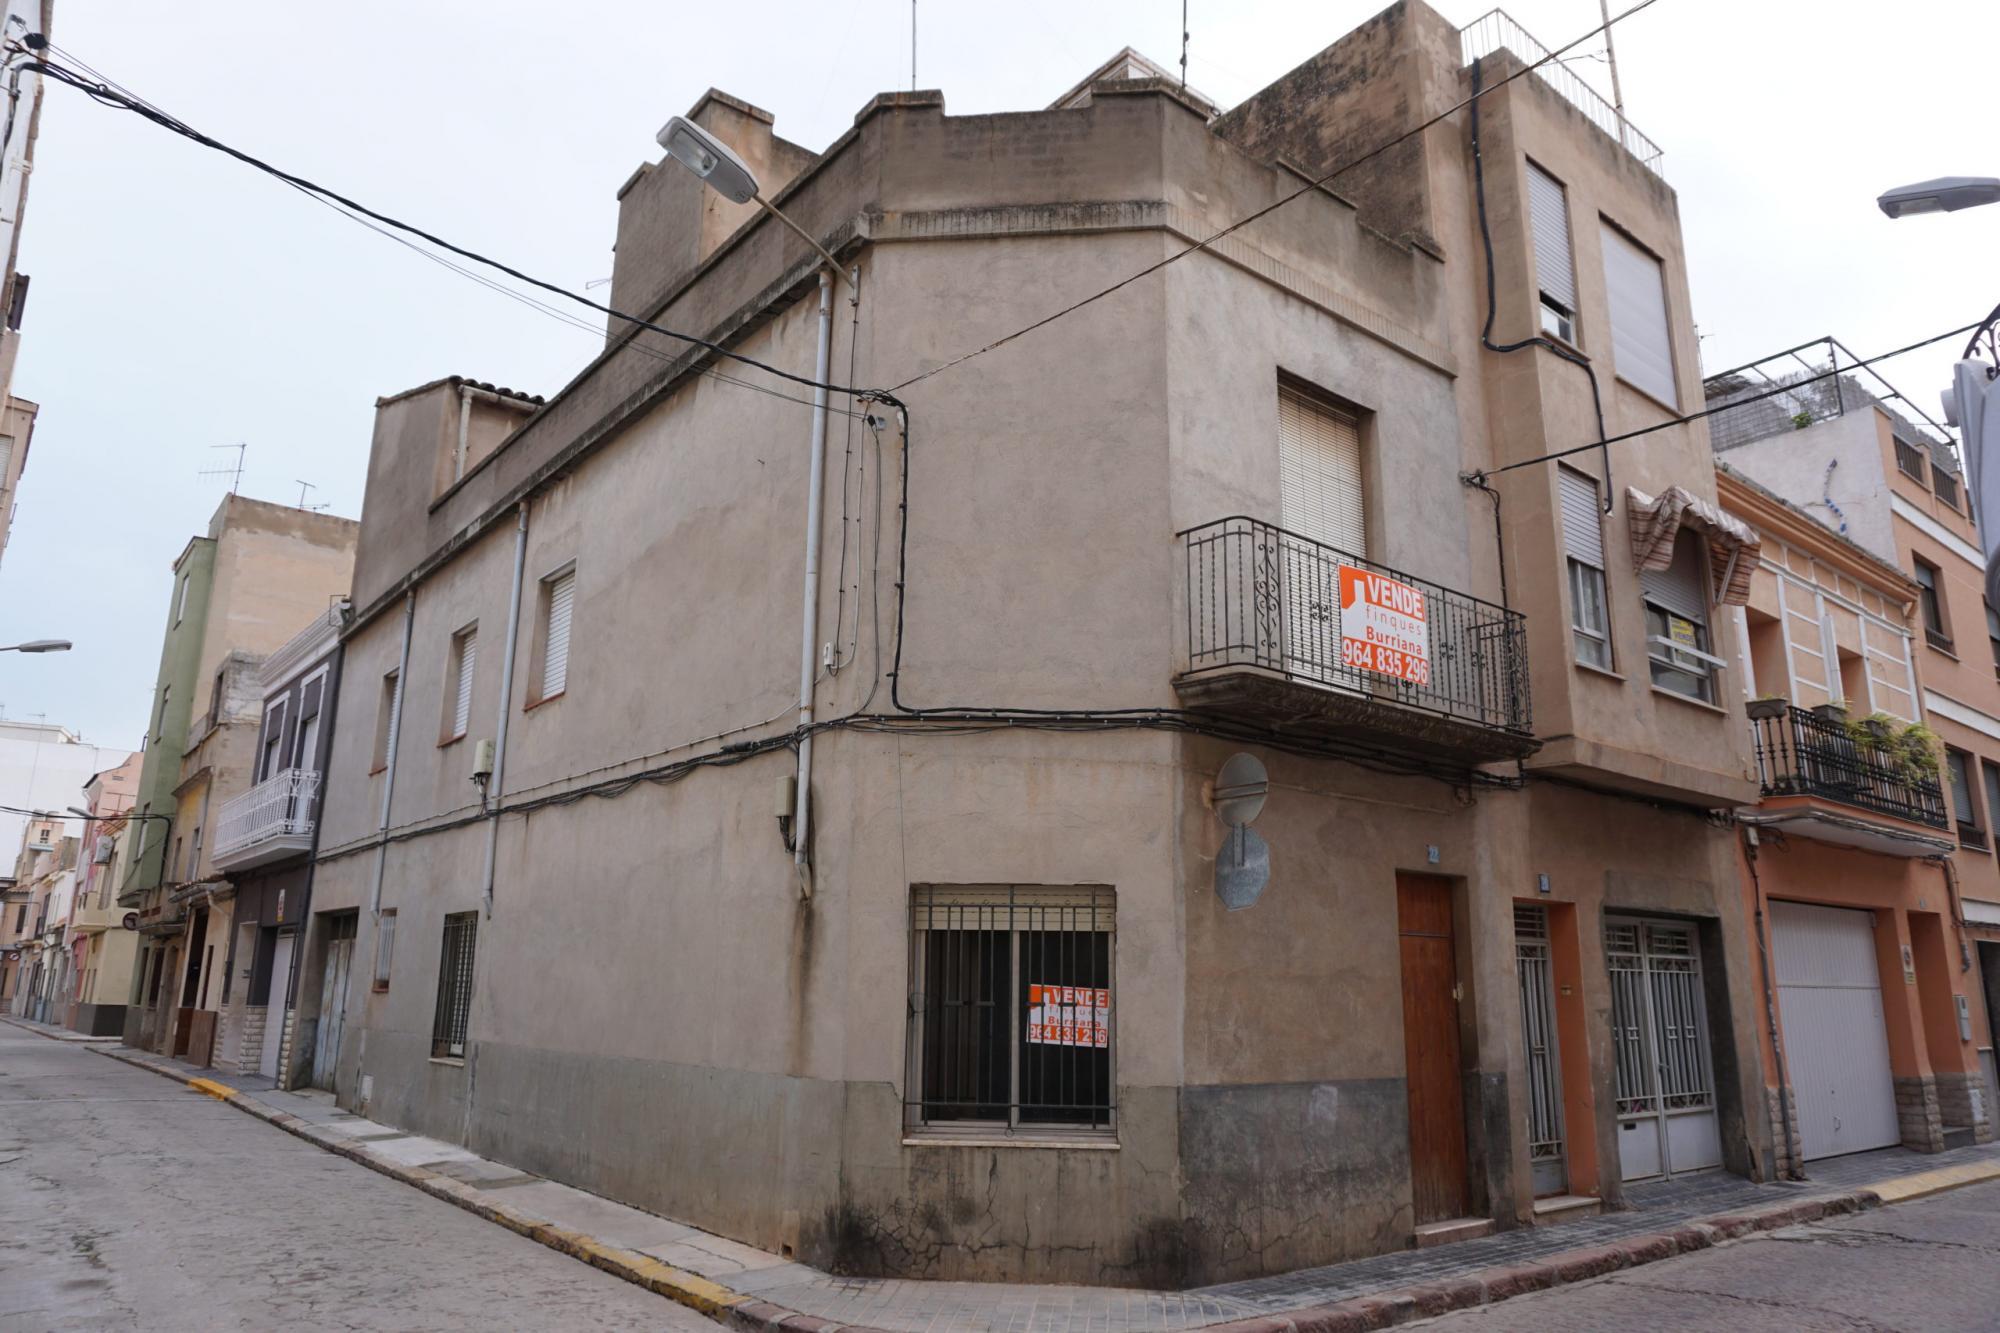 Casa en Venta en Burriana (Castellón) zona Río